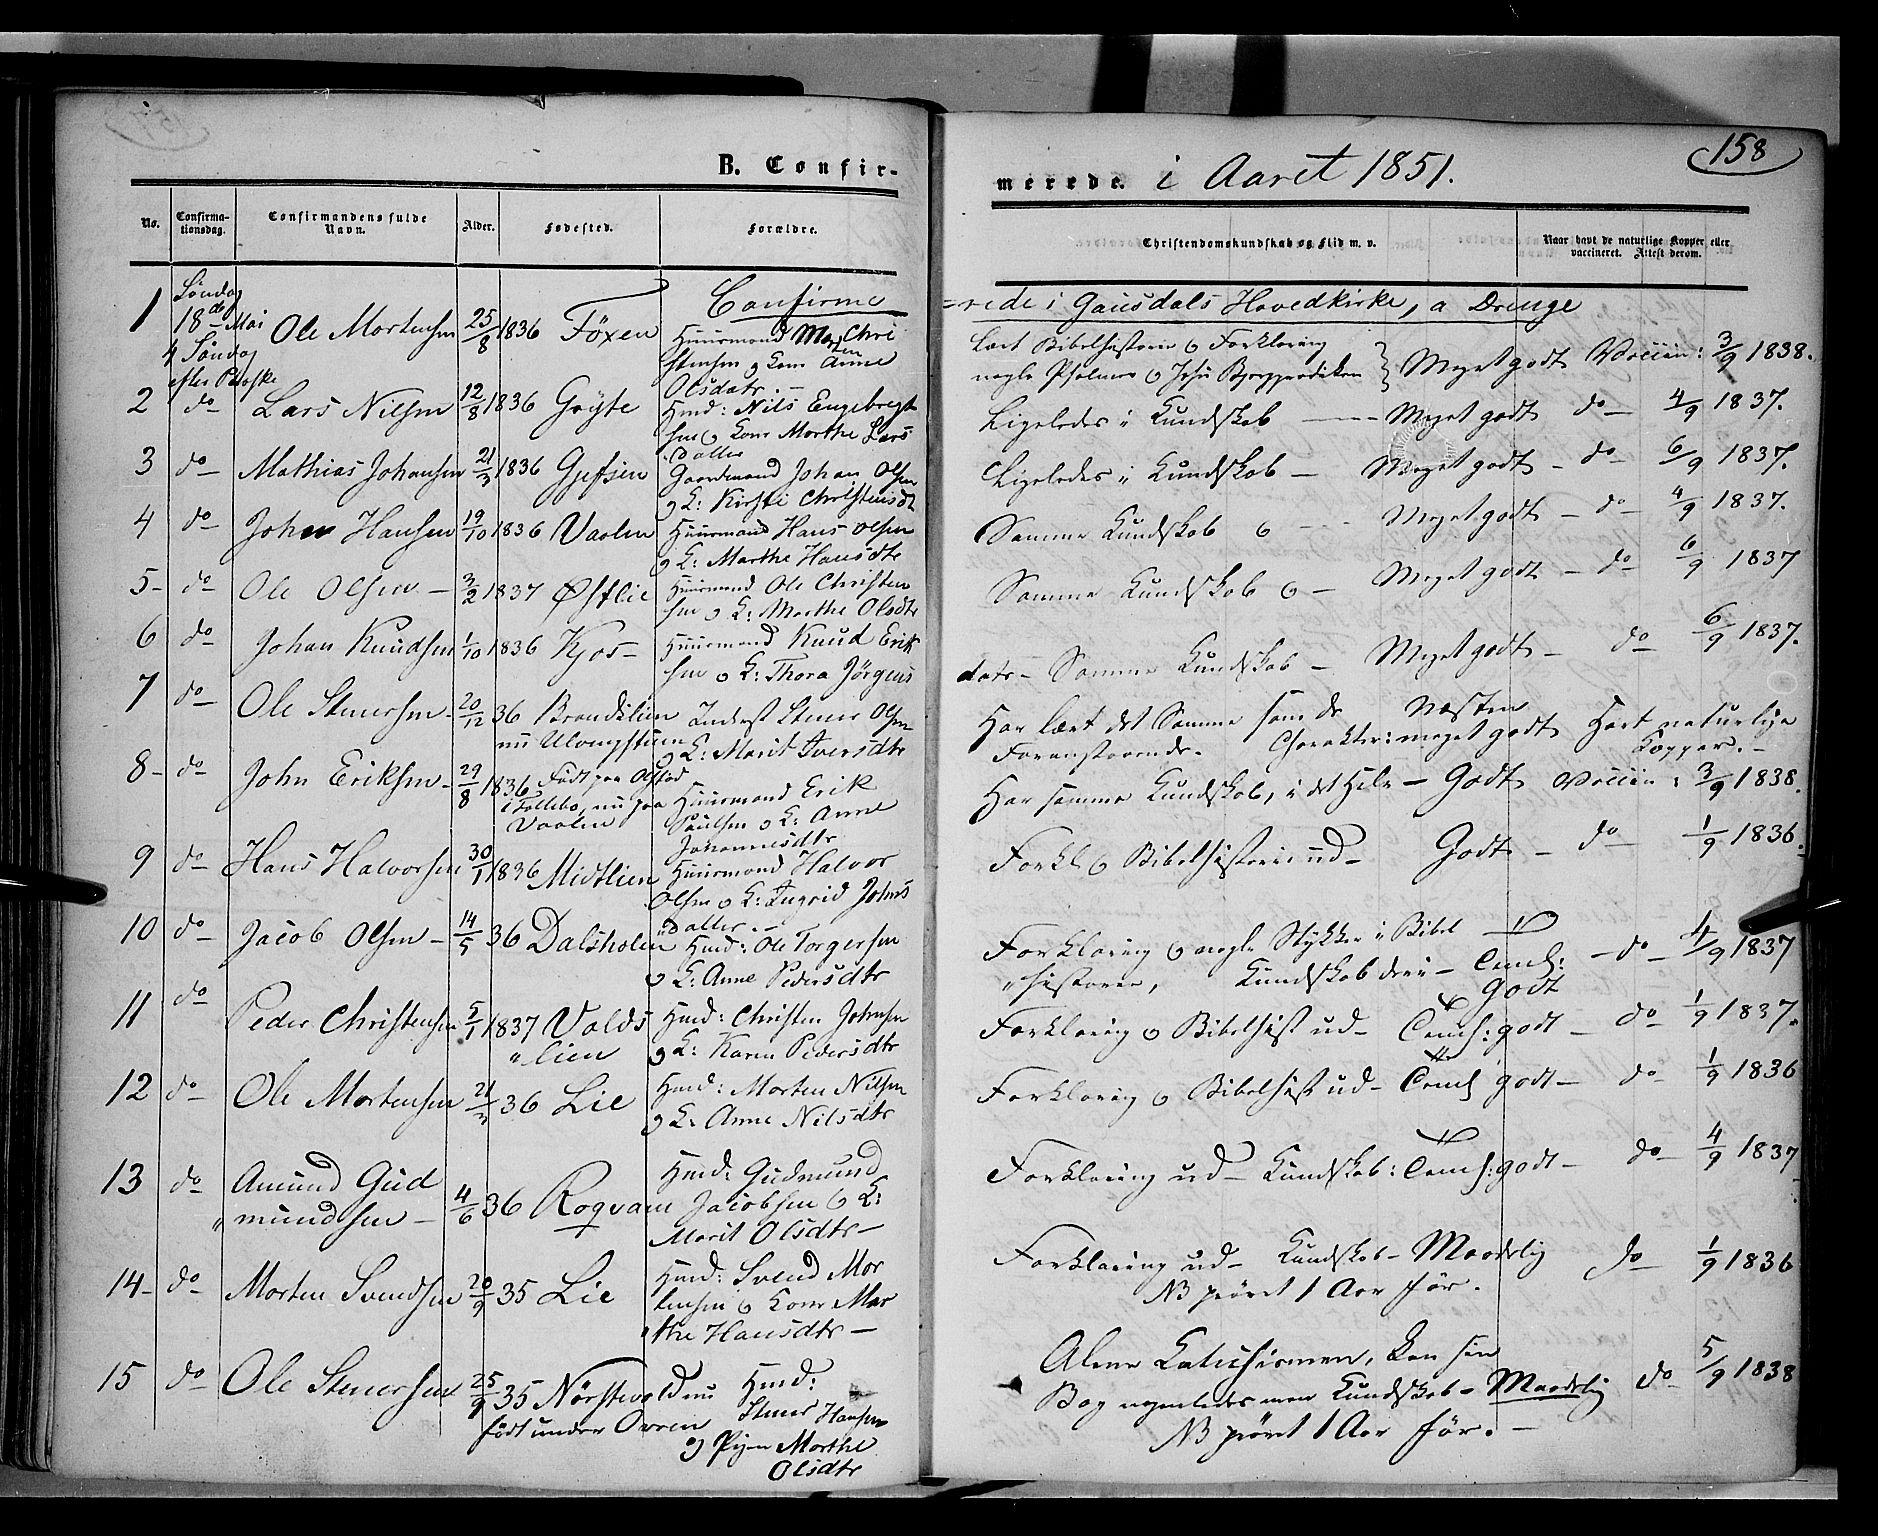 SAH, Gausdal prestekontor, Ministerialbok nr. 8, 1850-1861, s. 158